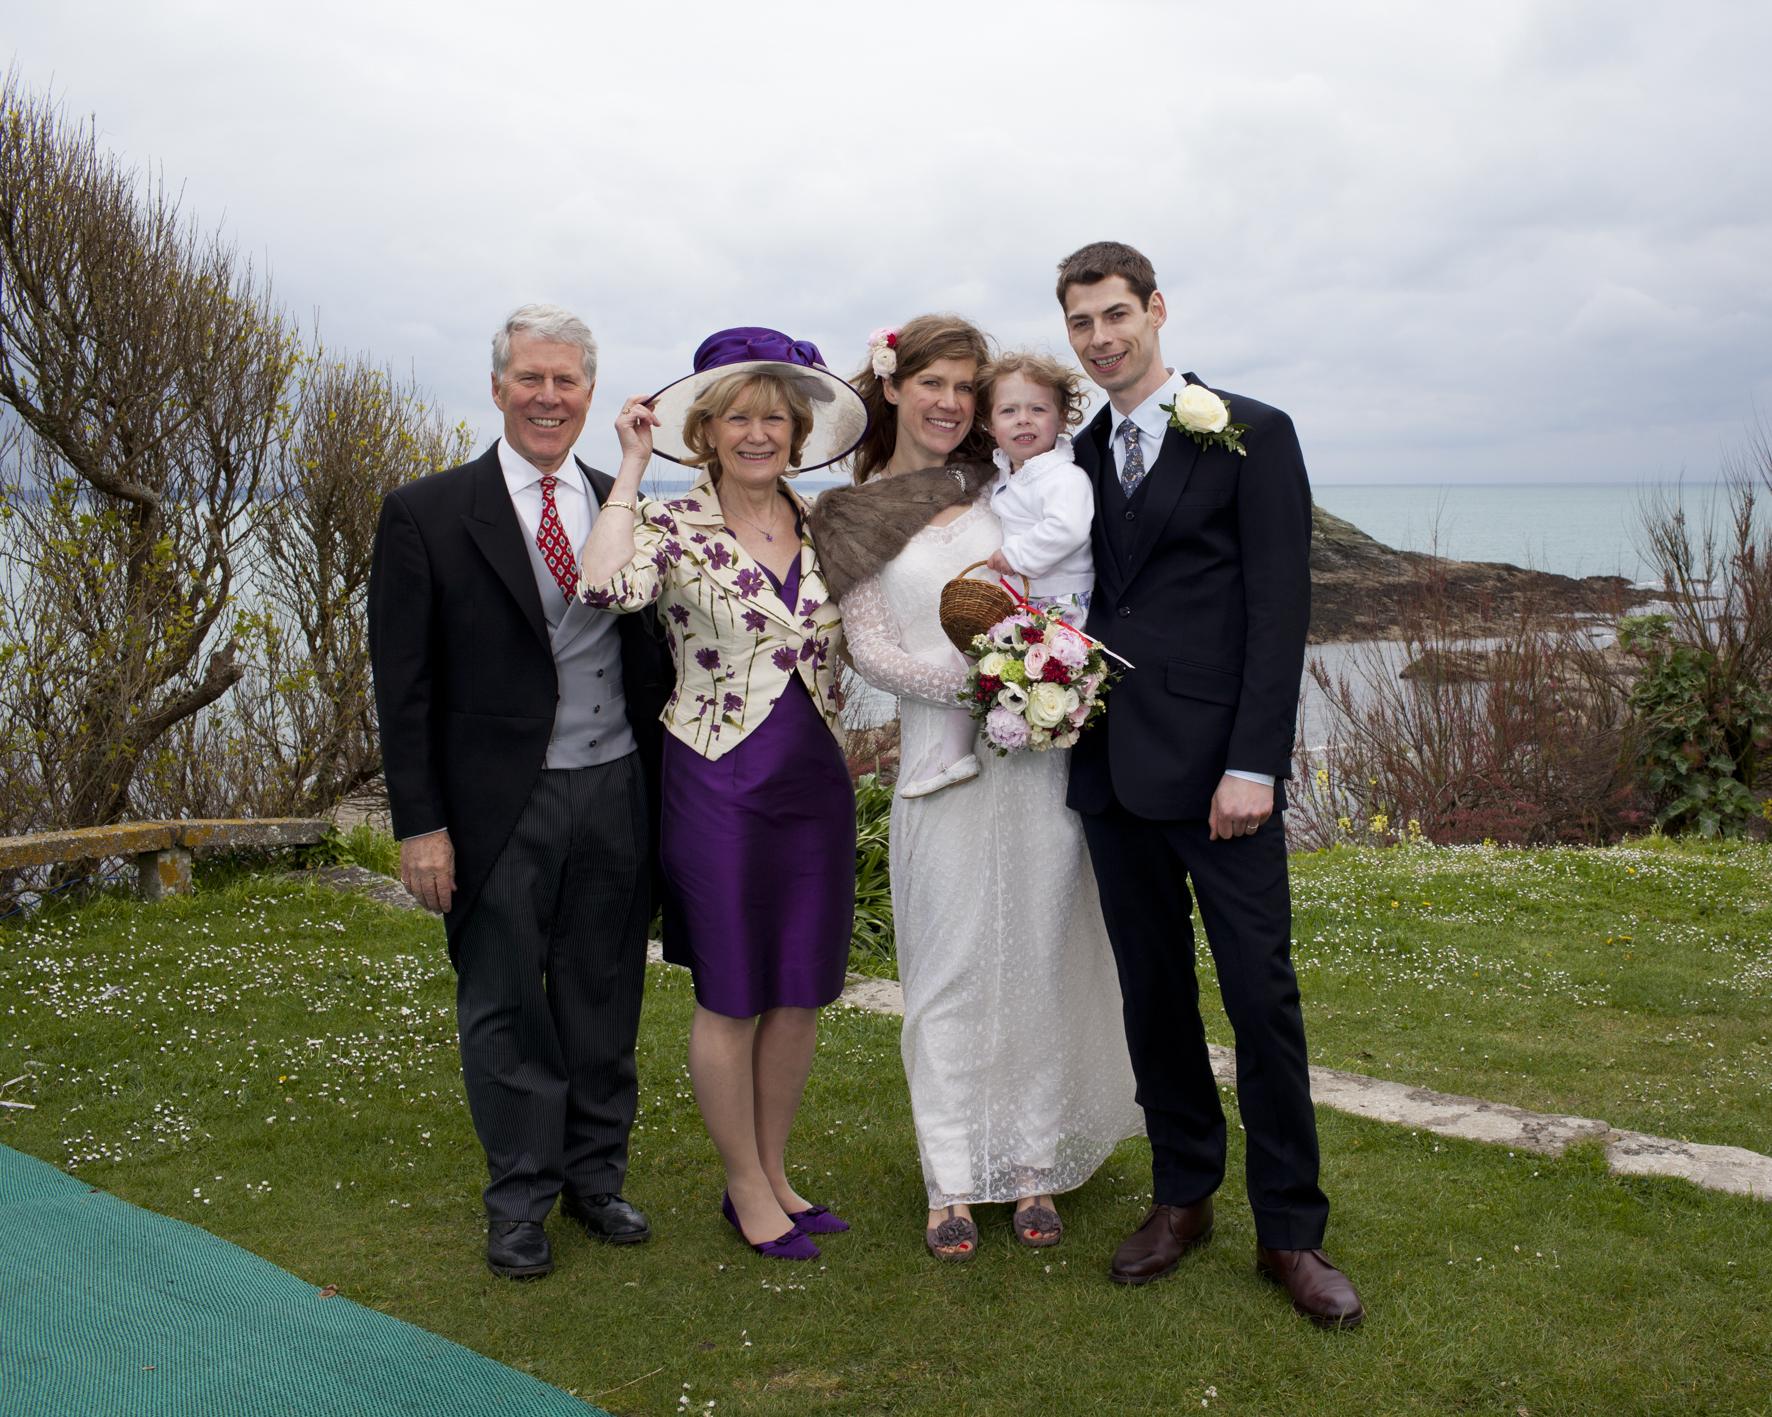 Wedding example_M&P__MG_3694_Claudia Leisinger.jpg